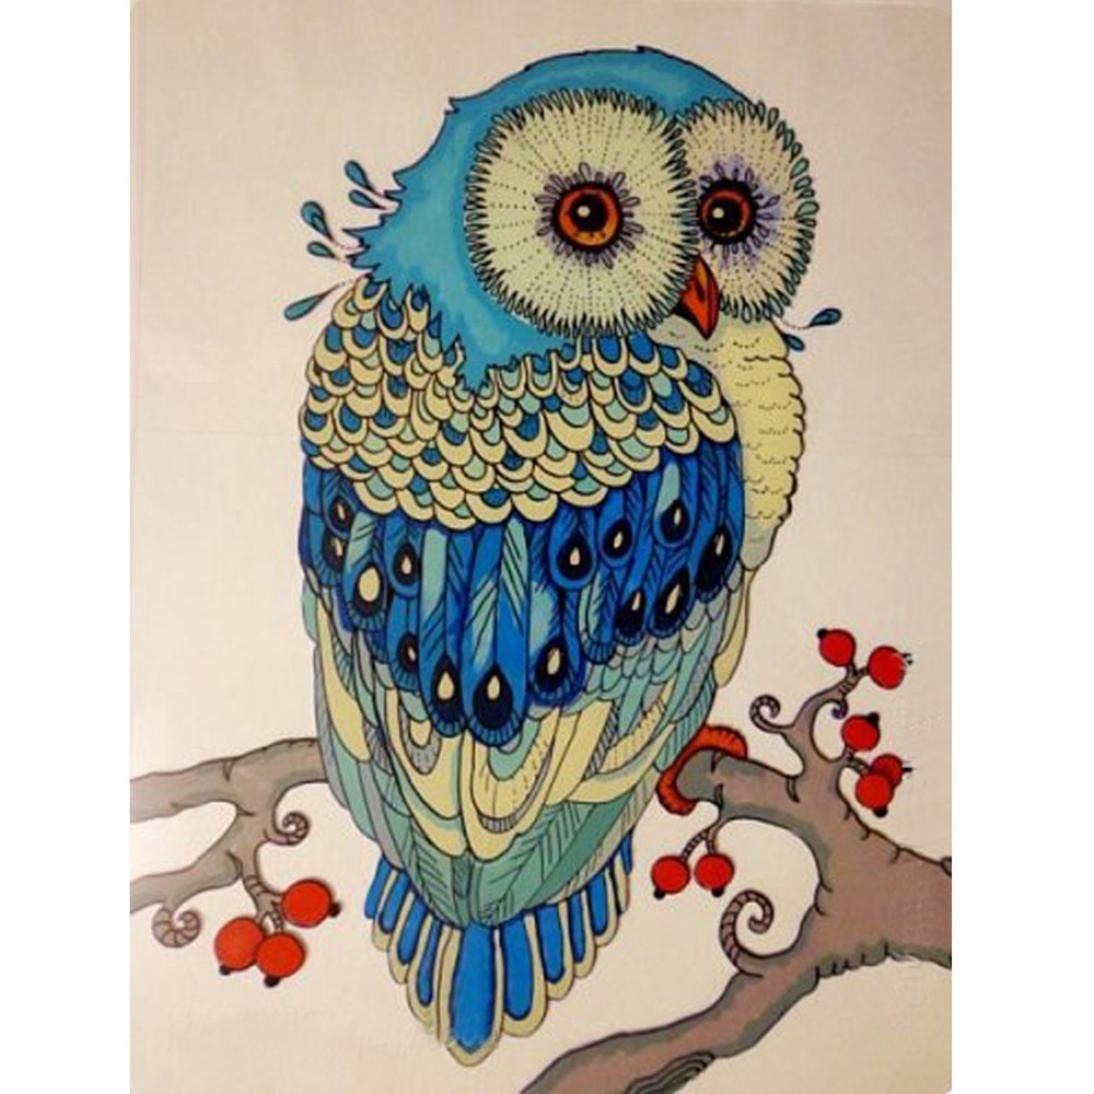 Full Drill DIY 5D Diamond Painting Embroidery Cross Craft Stitch Kit Decor C